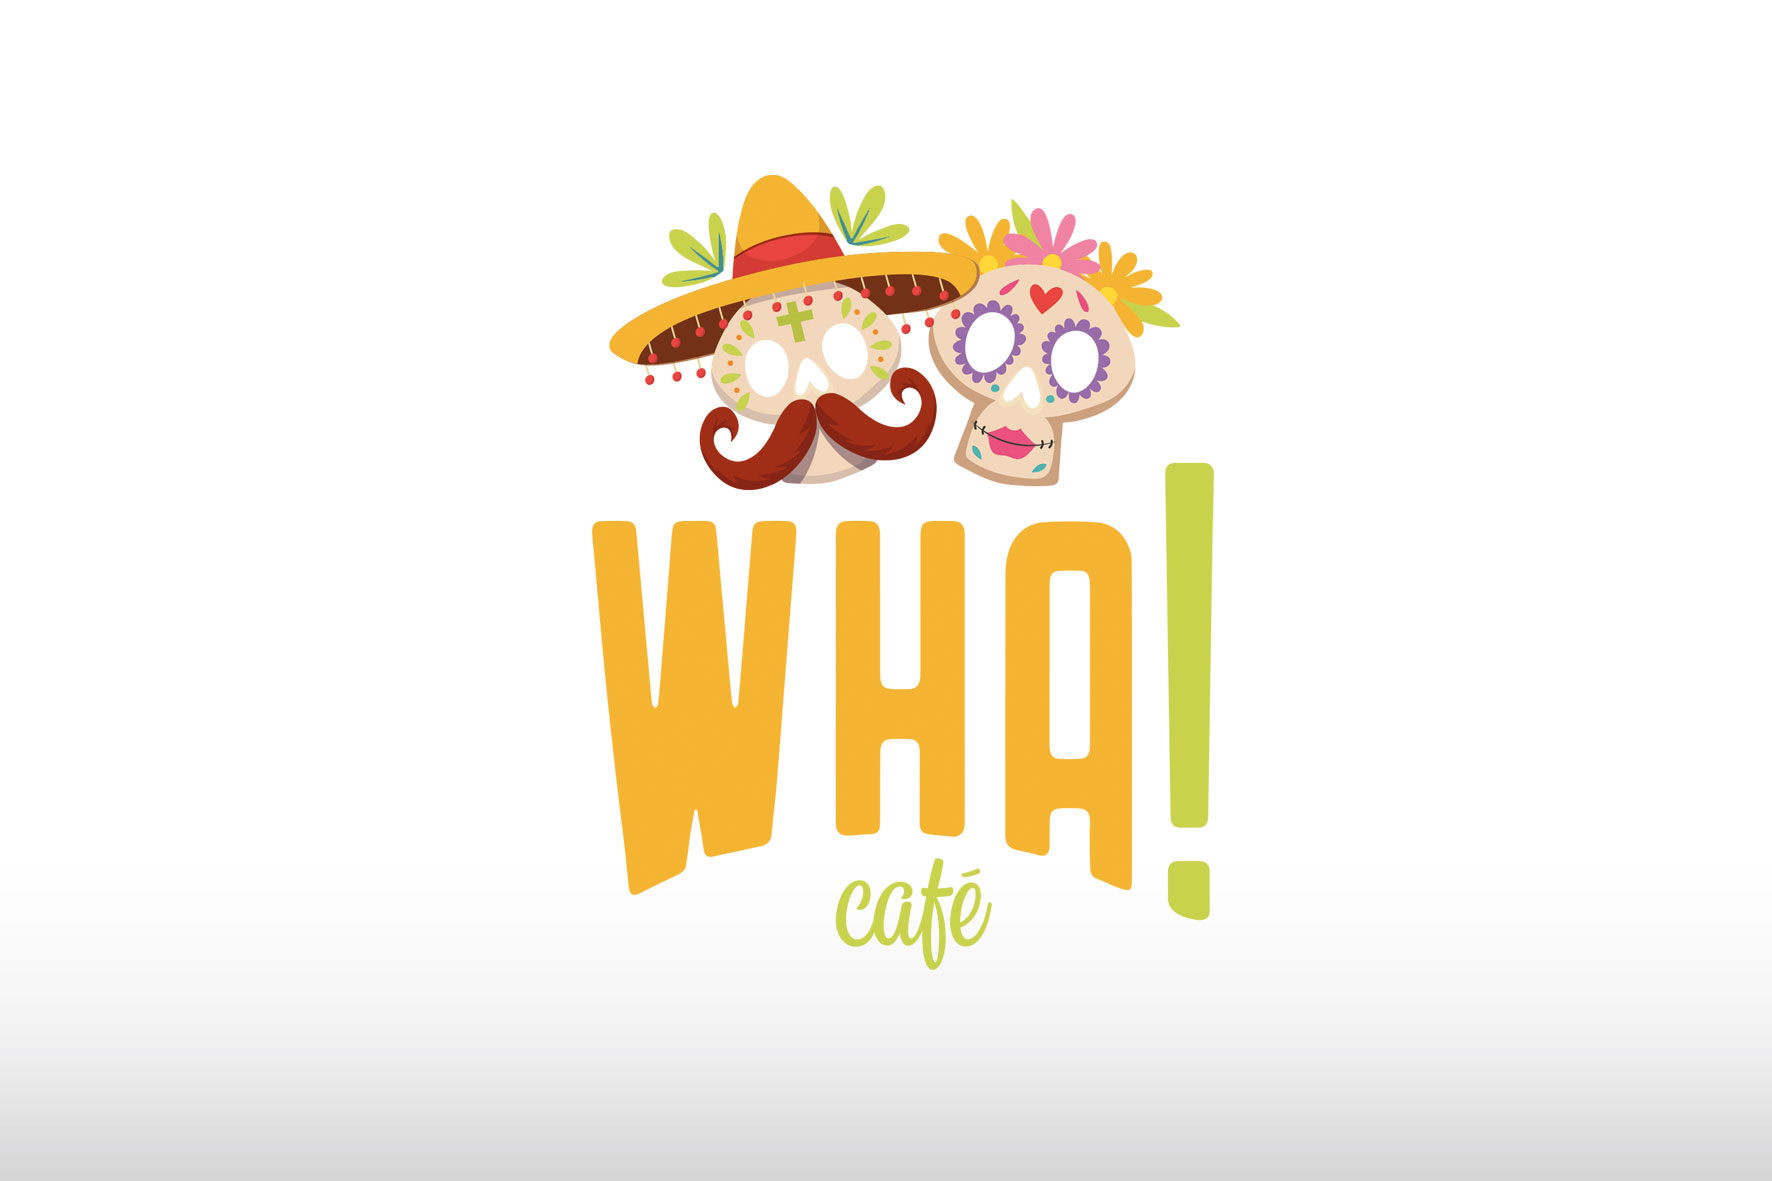 Restaurant Wha!